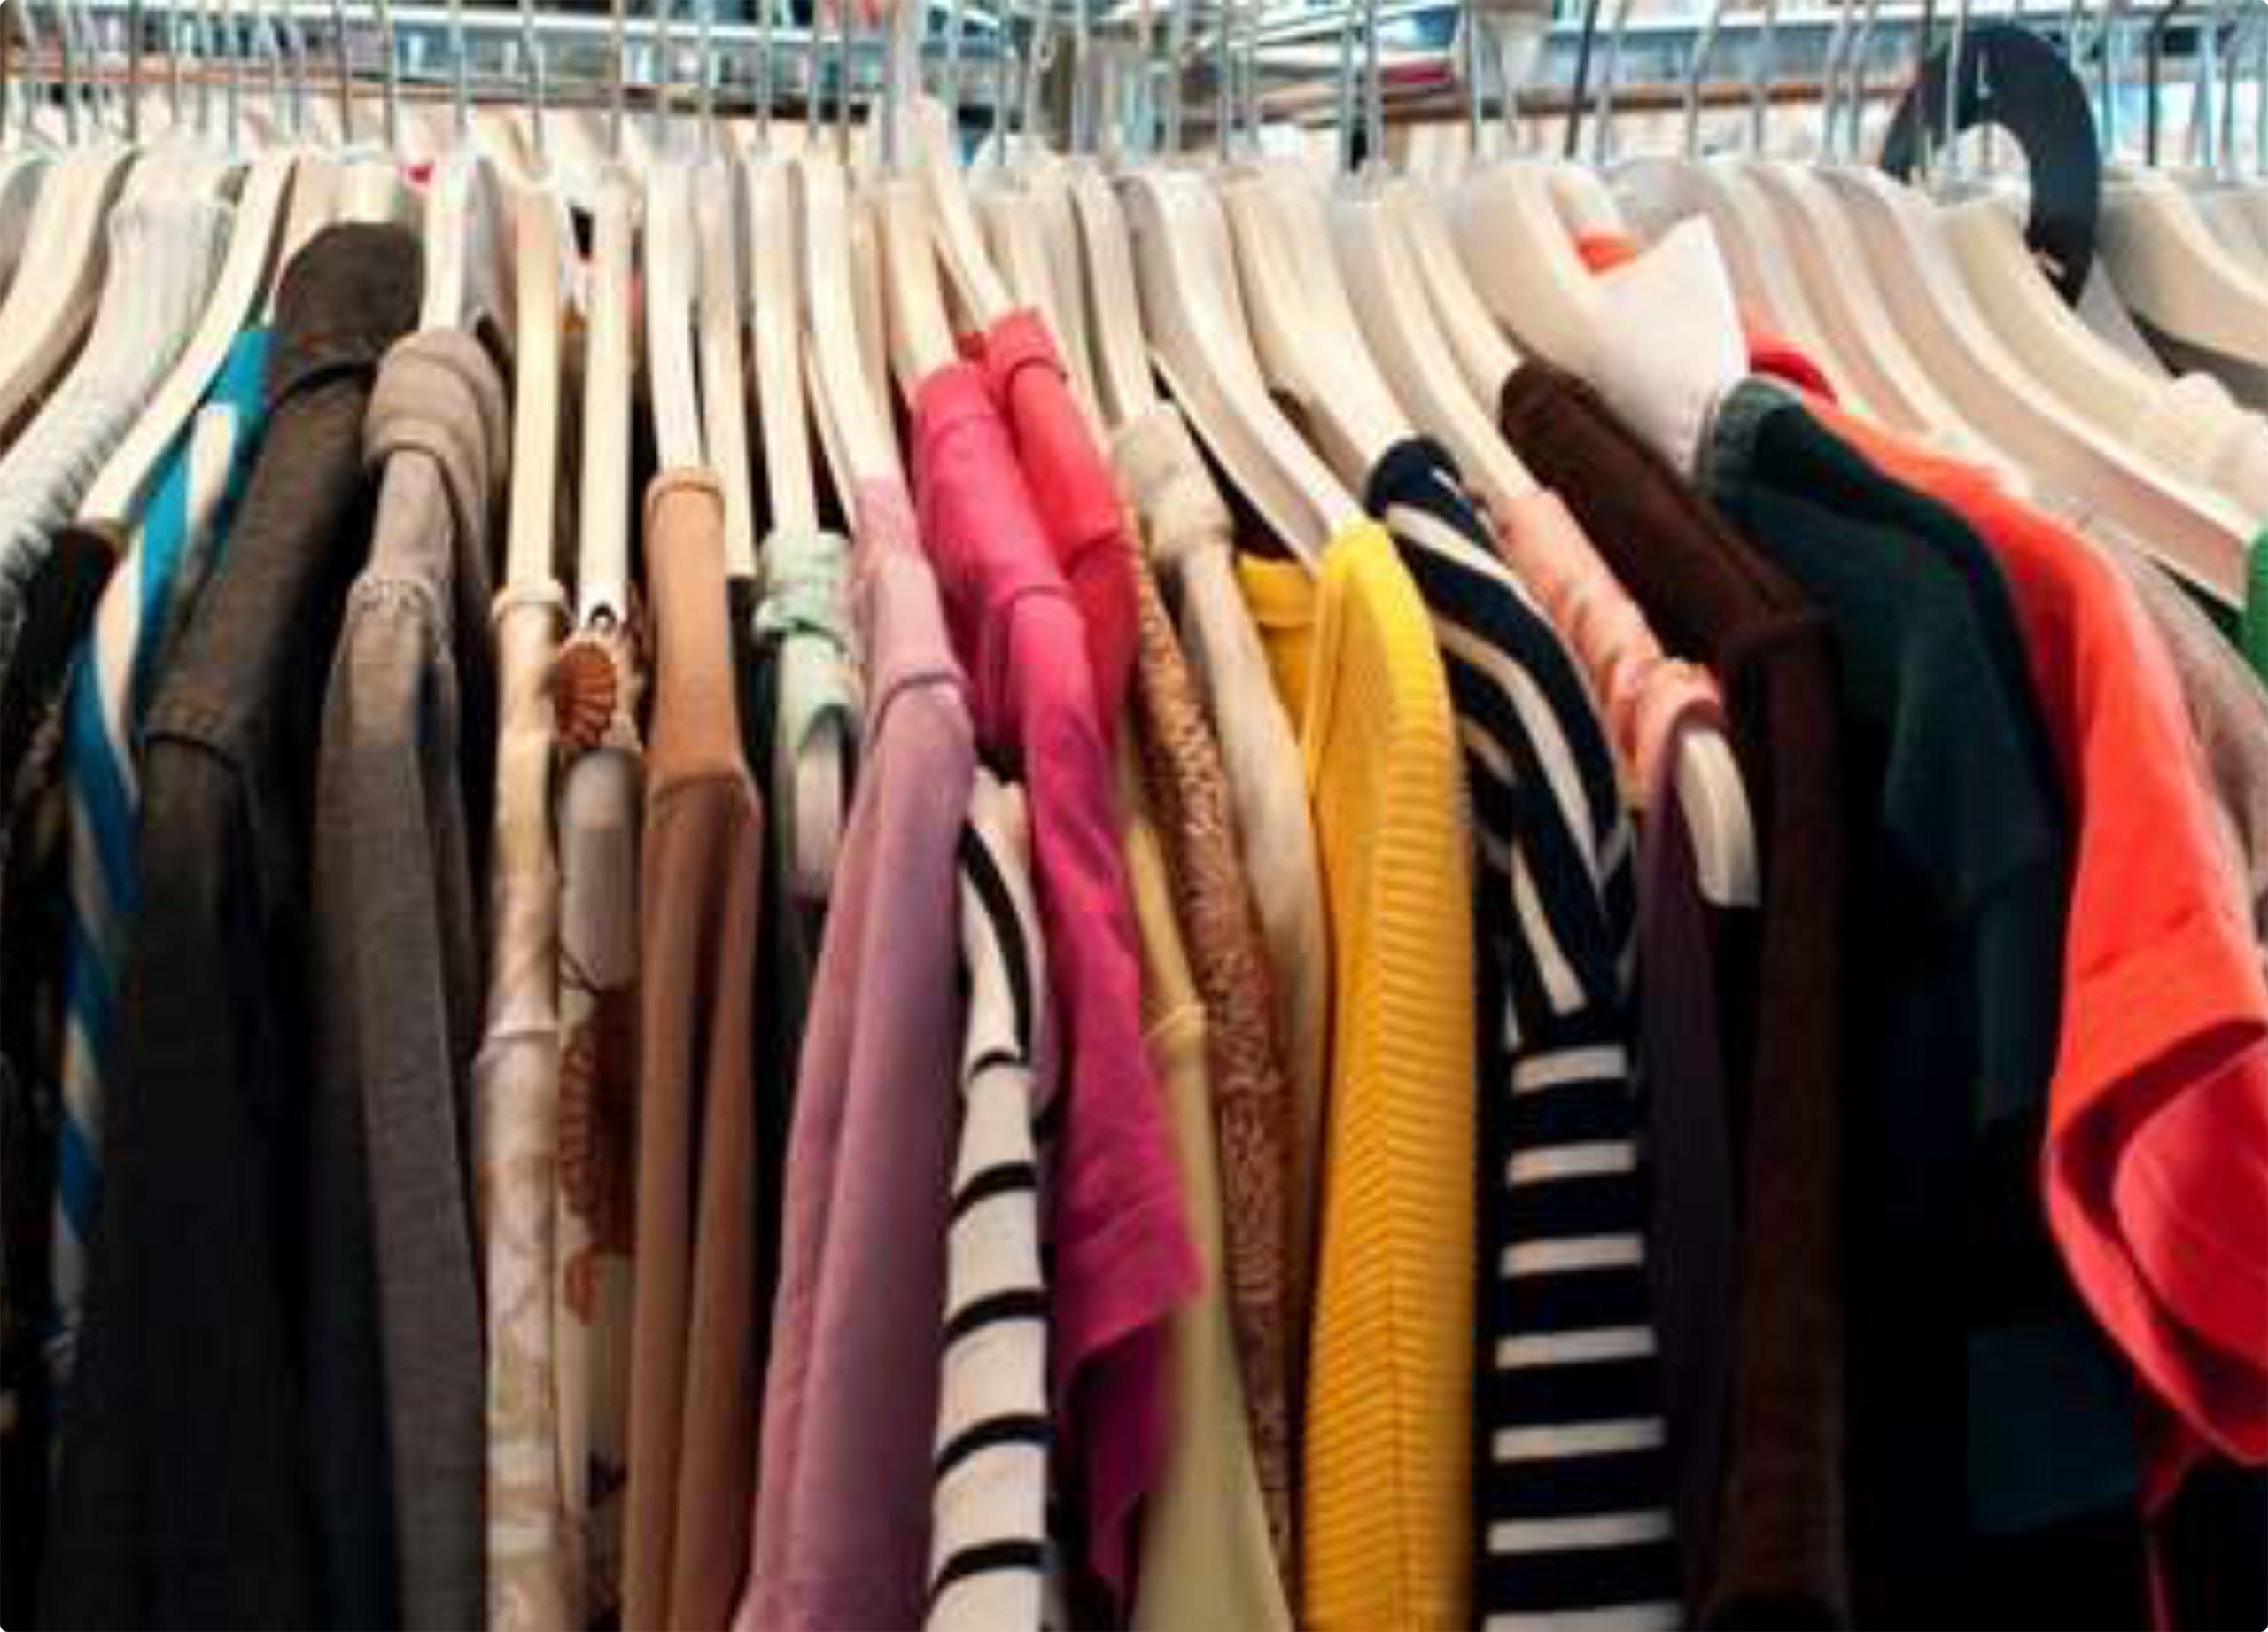 'Suka Bau Yang Baru Lepas Pakai'- Wanita Terima Mesej Lelaki Nak Beli Baju 'Preloved' Untuk Puaskan Nafsu 3